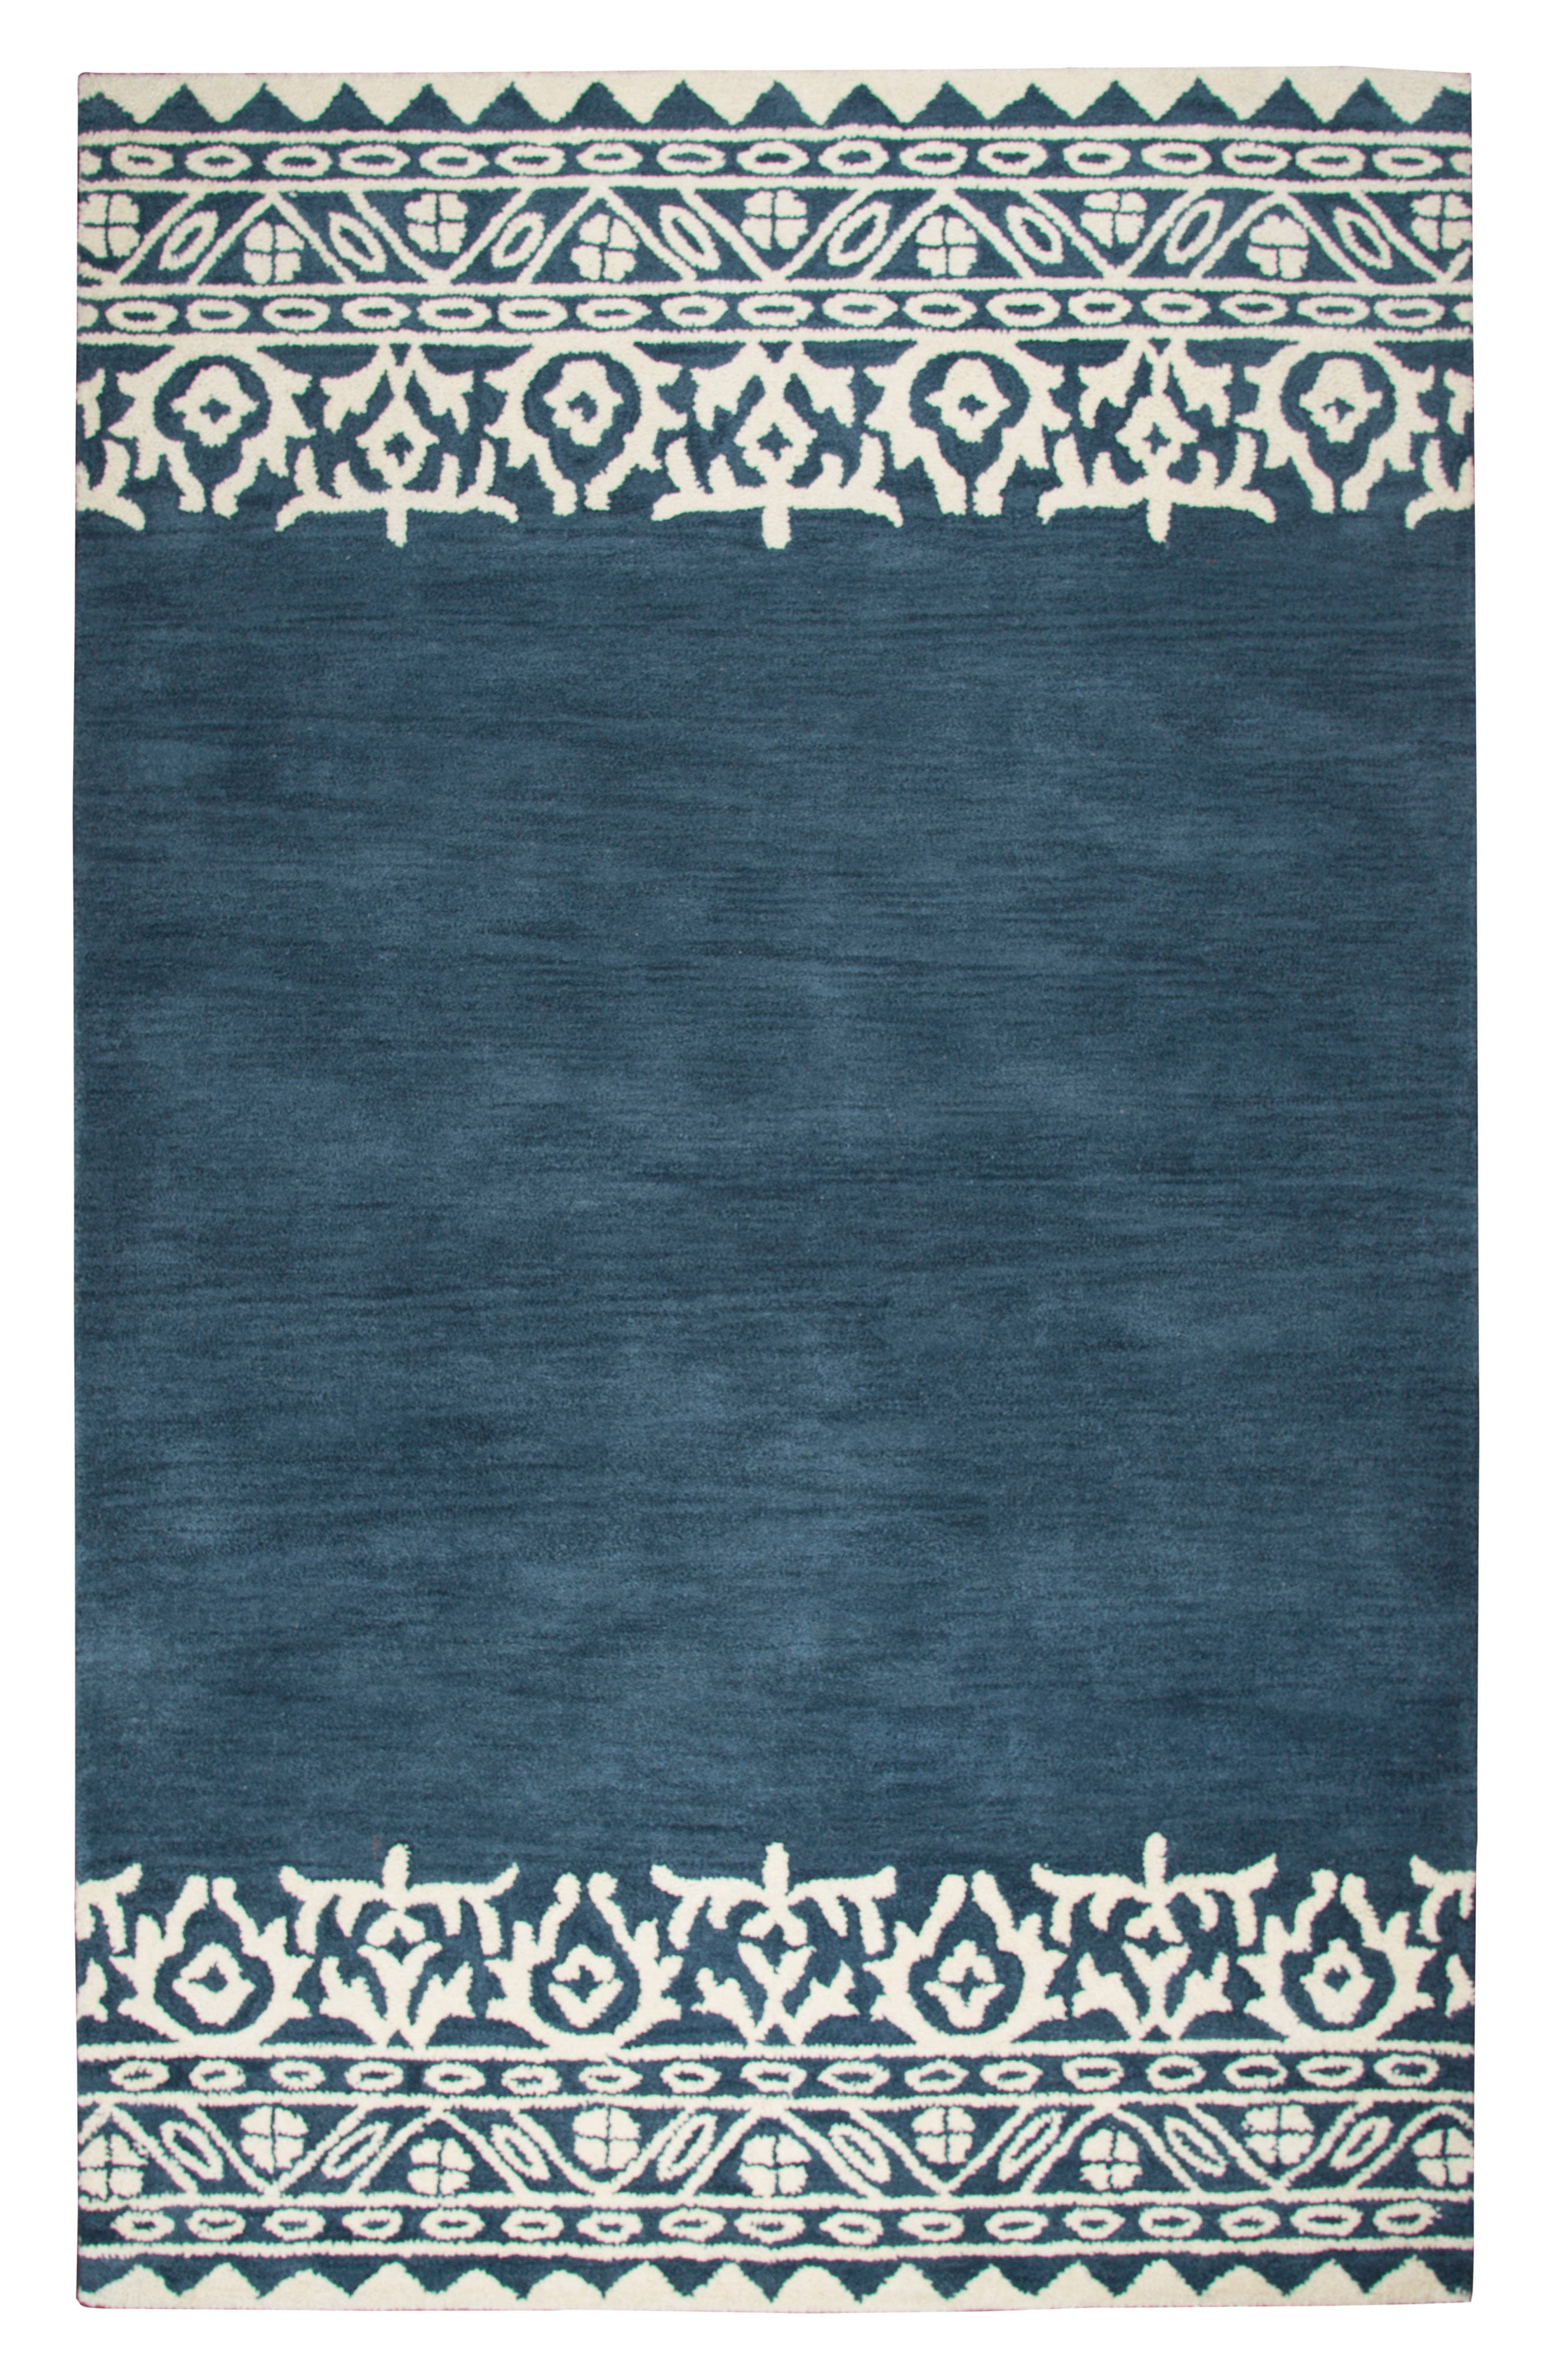 Framed Medallion Hand Tufted Wool Area Rug,                         Main,                         color, 400